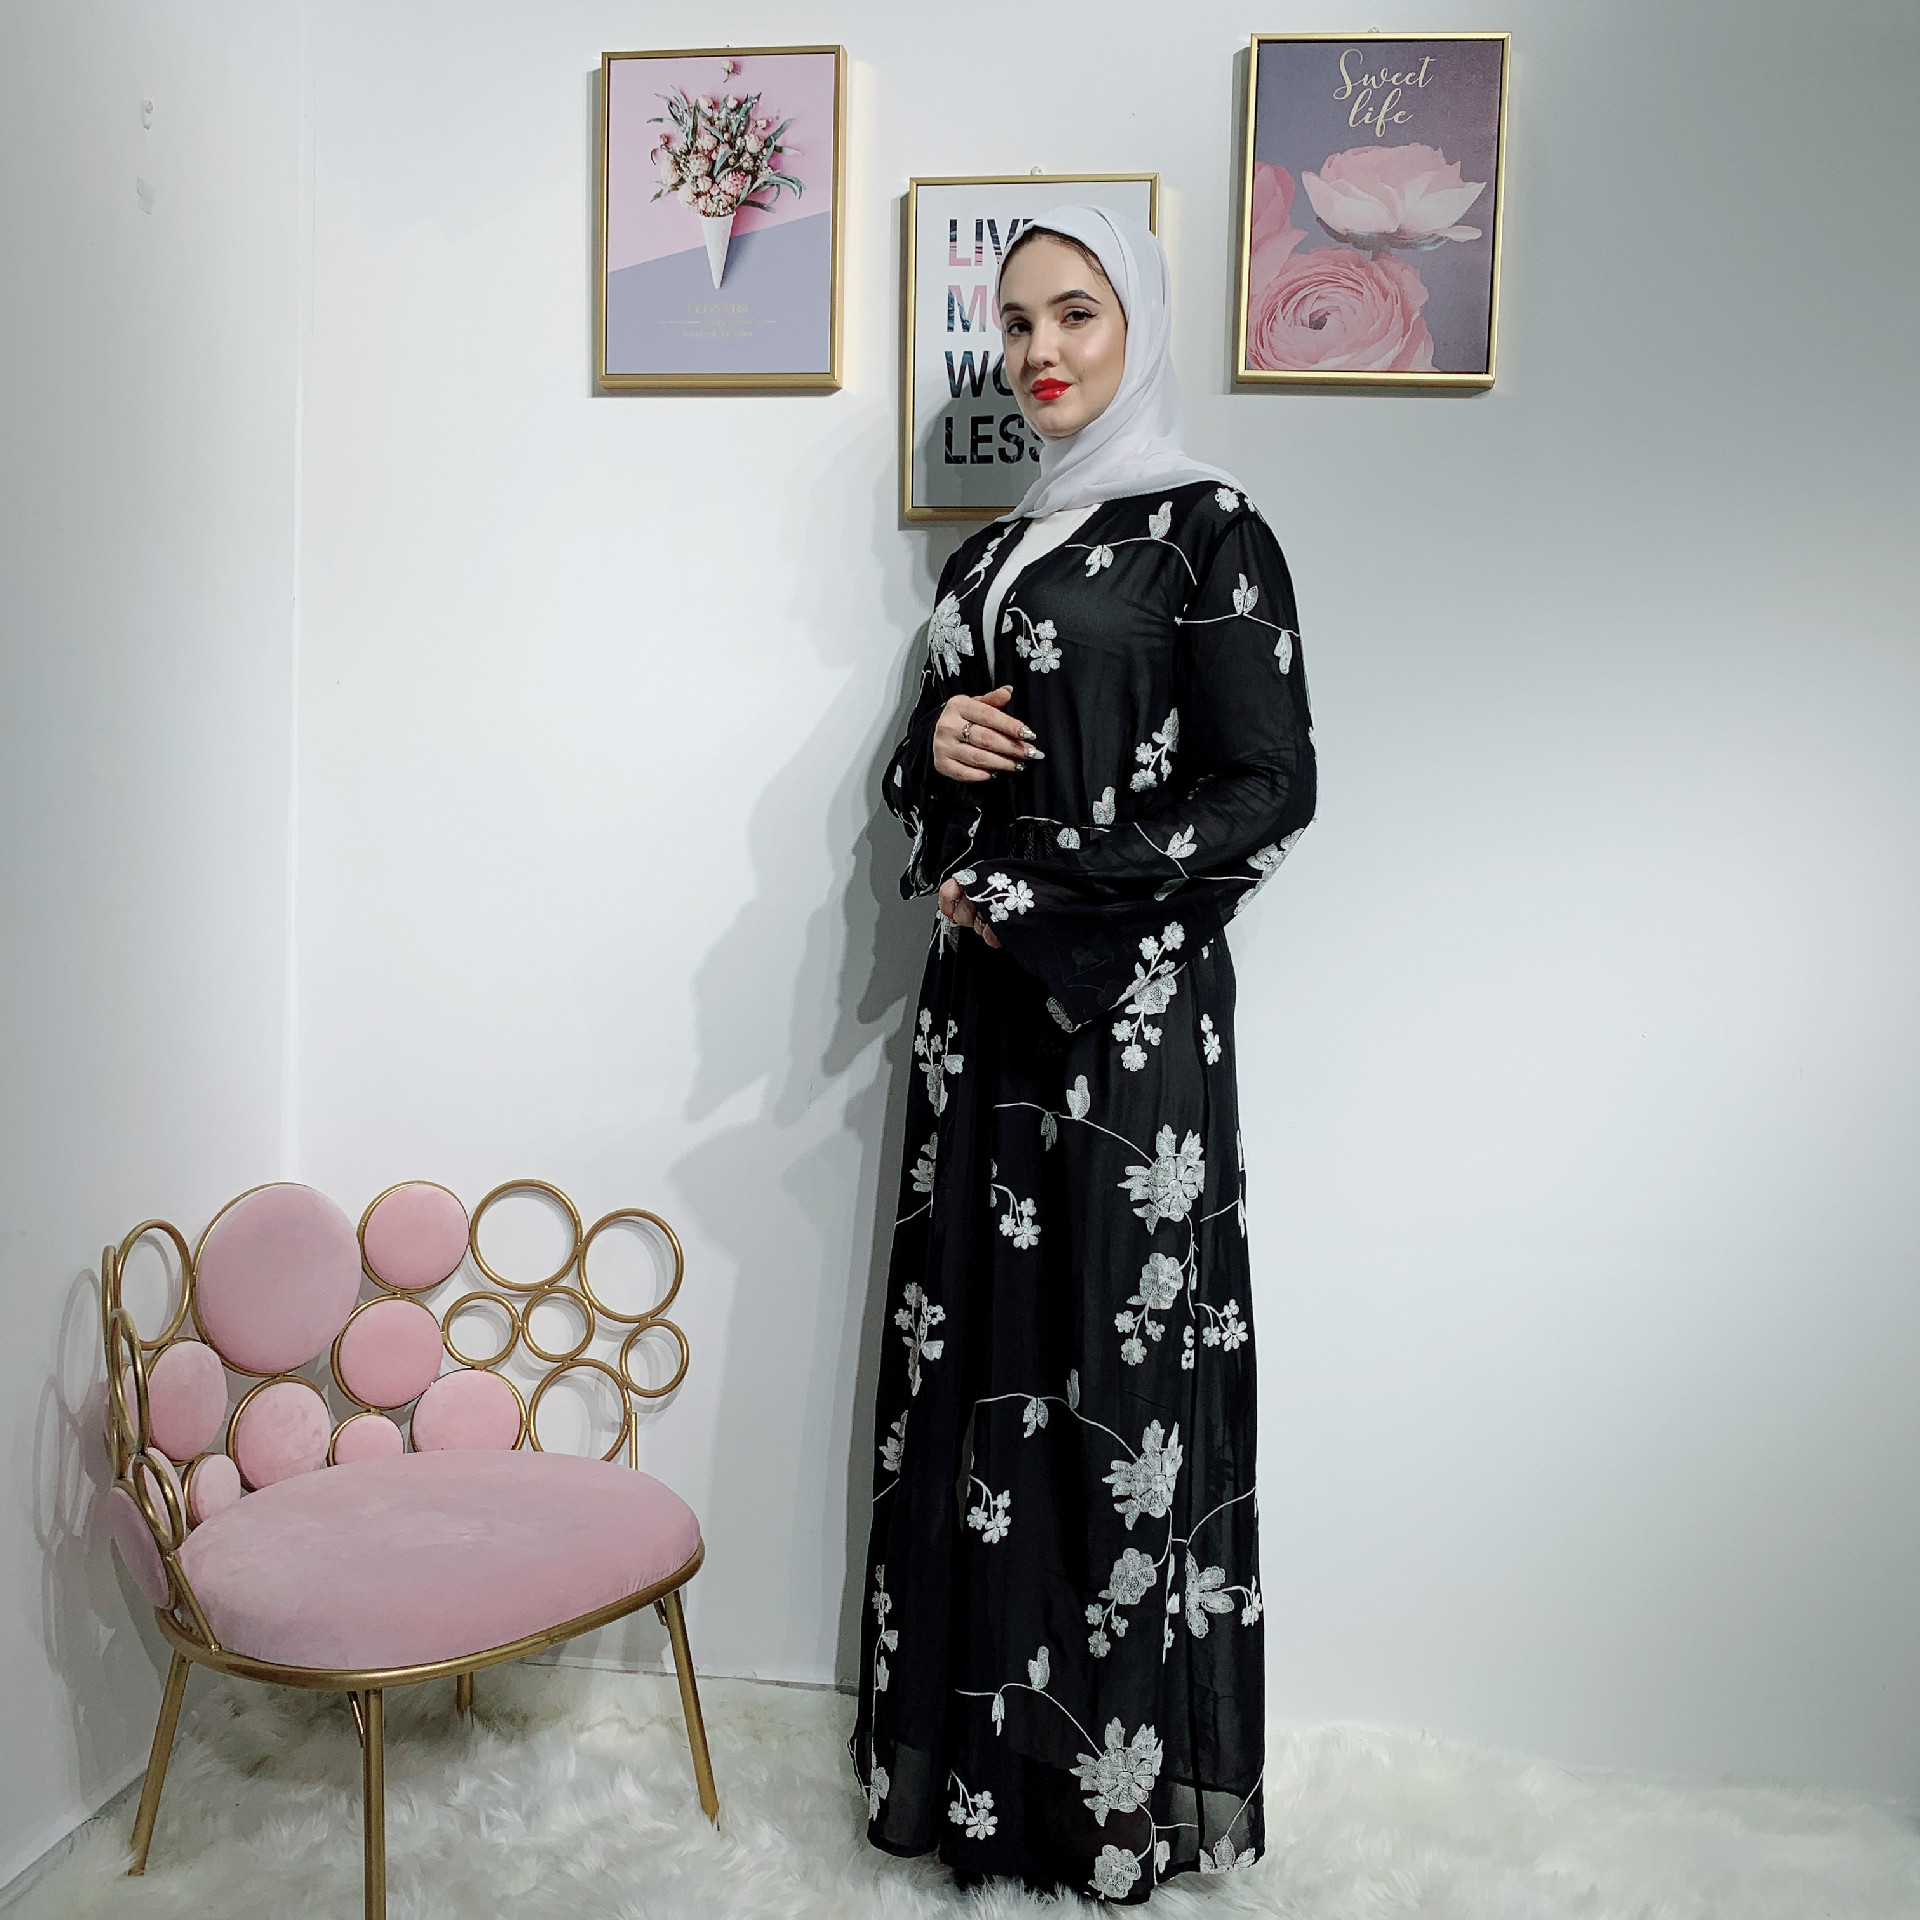 Dubaï Abaya femmes musulmanes Robe Caftan Kimono Bangladesh Robe Musulmane vêtements islamiques Caftan Marocain Robe des émirats arabes unis Robe d'impression